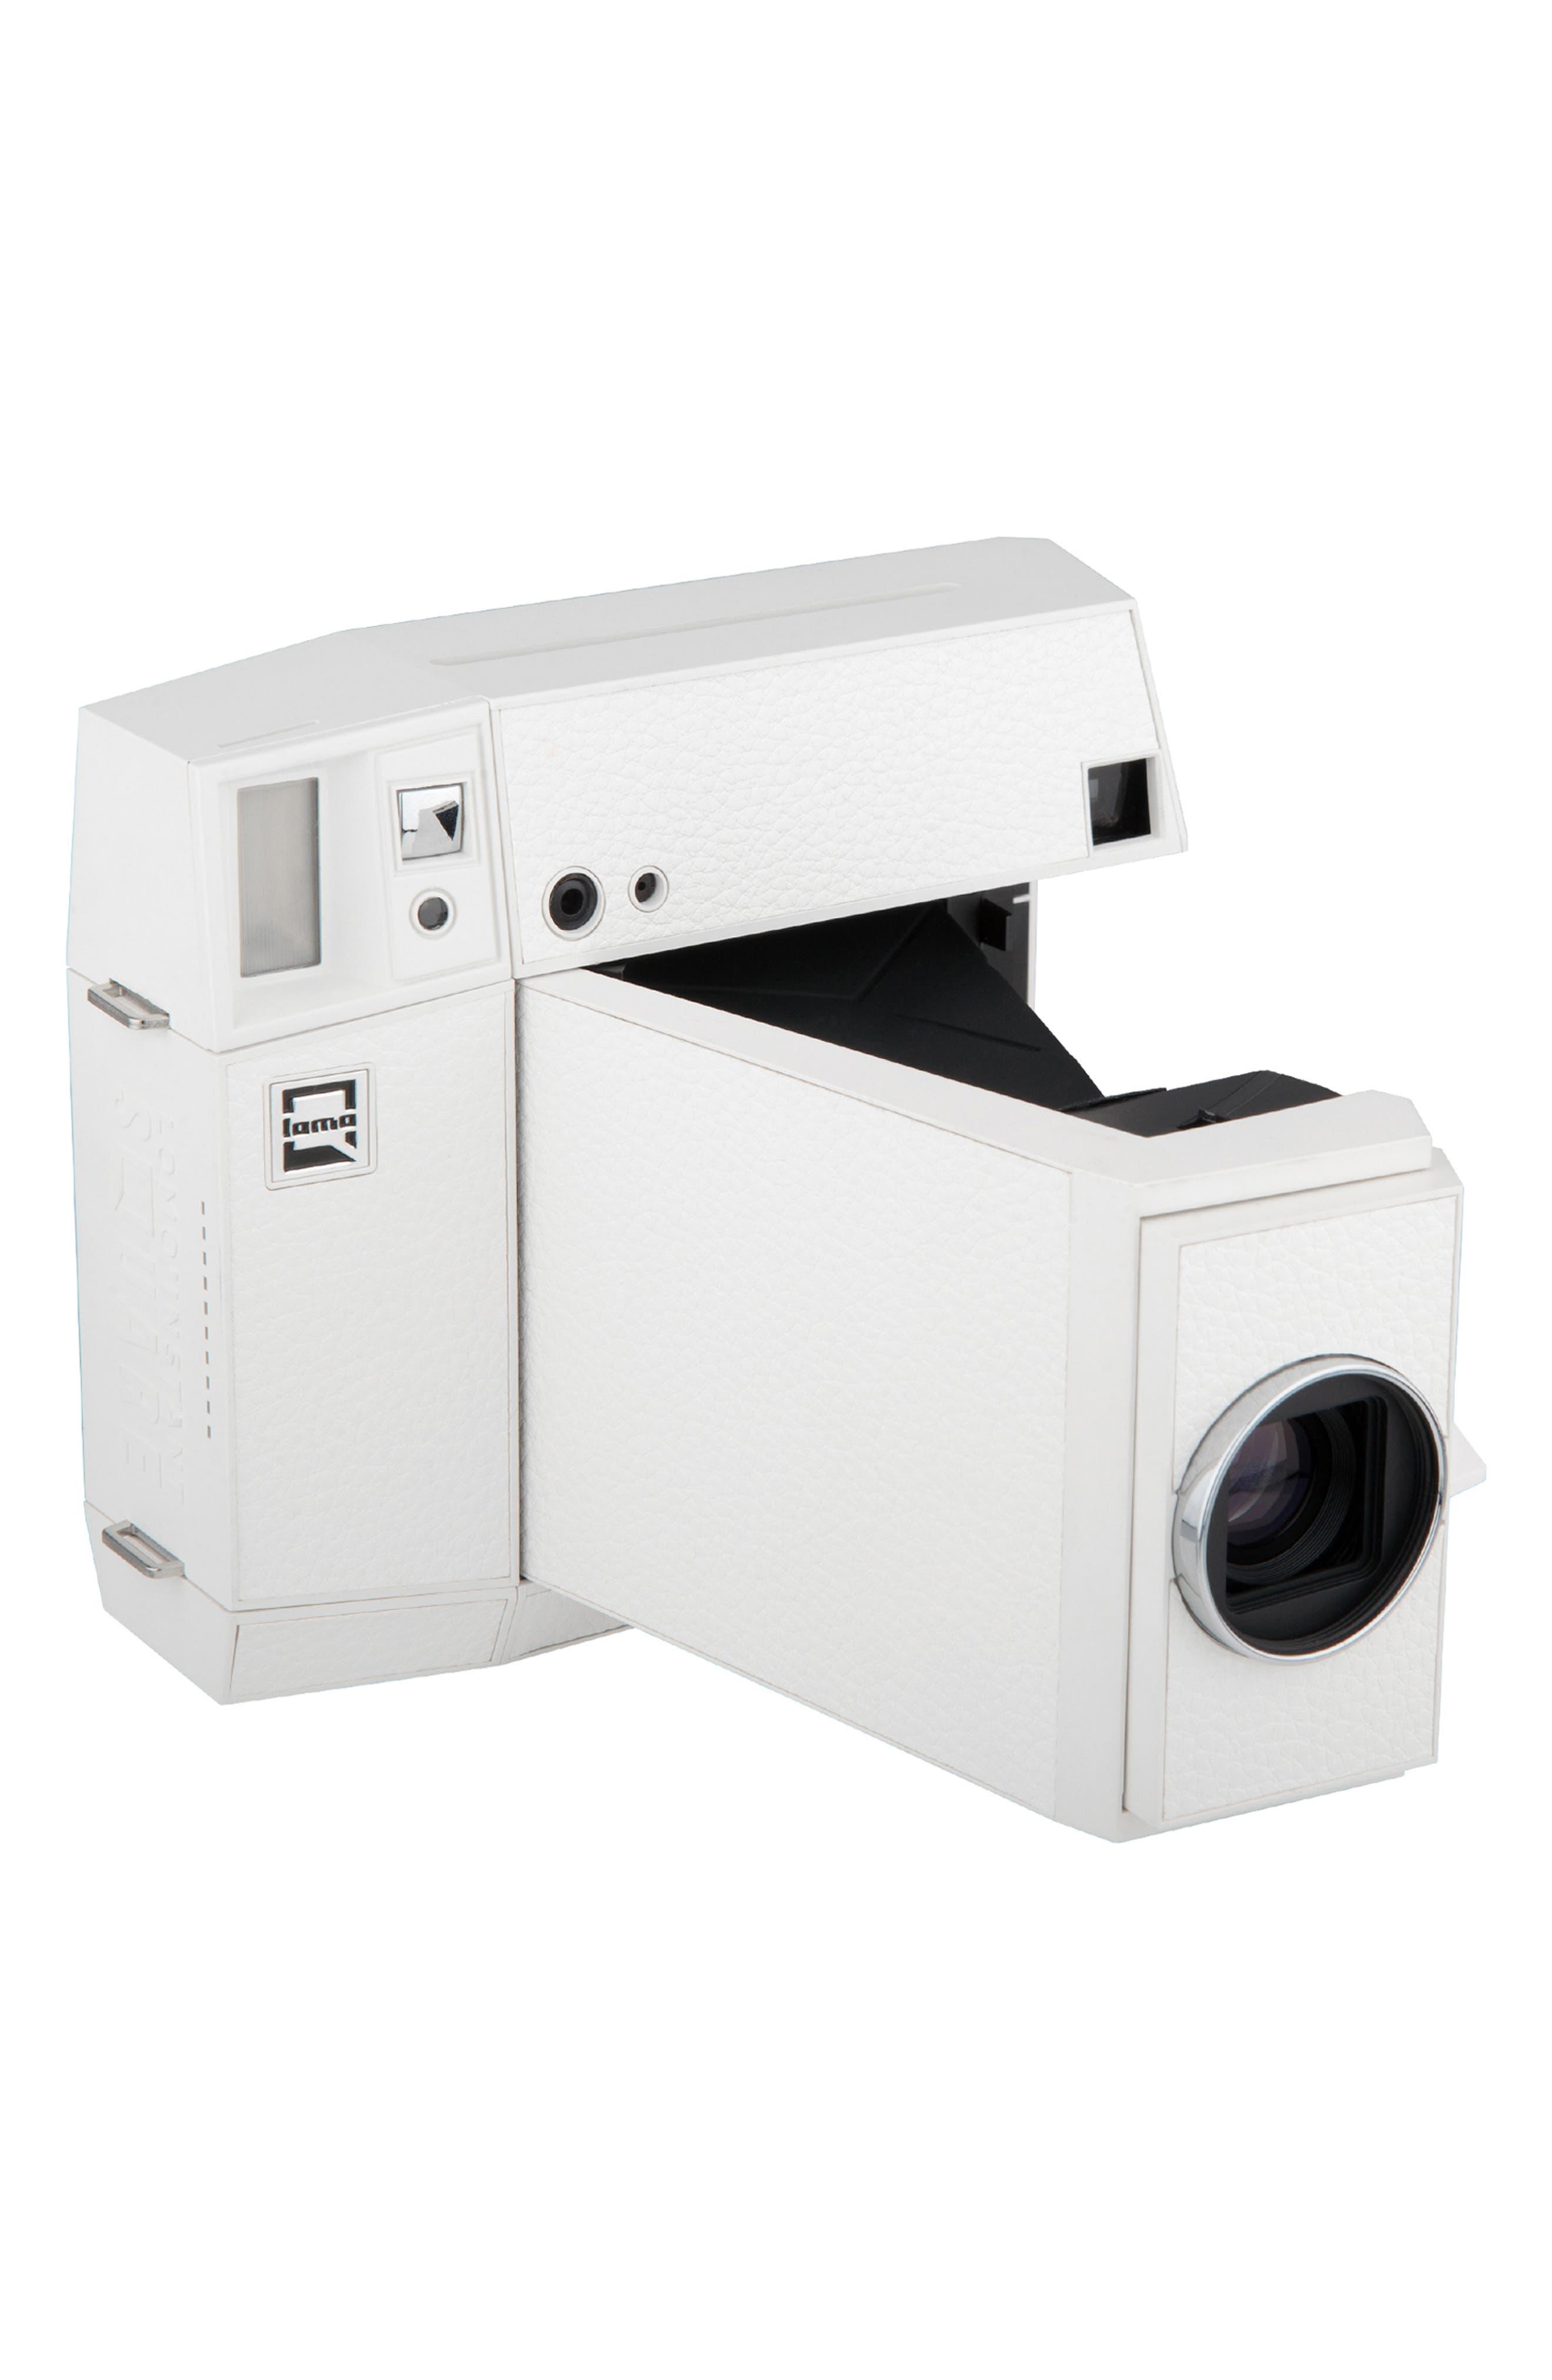 Lomo'Instant Square Glass Black Edition Instant Camera,                             Alternate thumbnail 3, color,                             WHITE